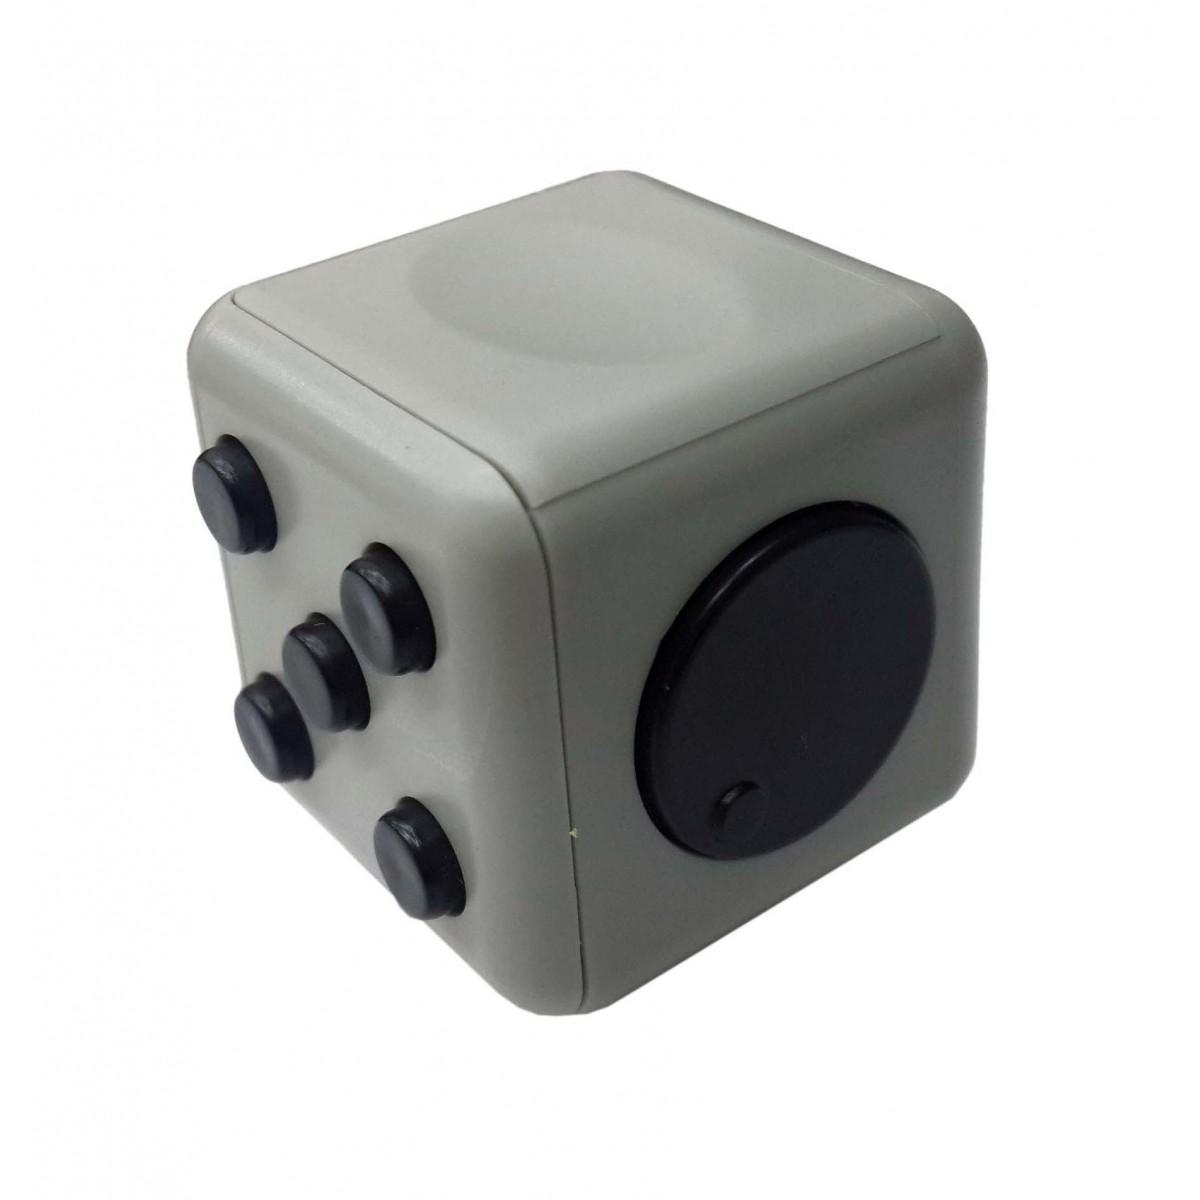 Fidget Cubo Para Relaxar Cube Anti Estresse Brinquedo Dedo Apertar Para Toc Cinza (BSL-GIRA-3)